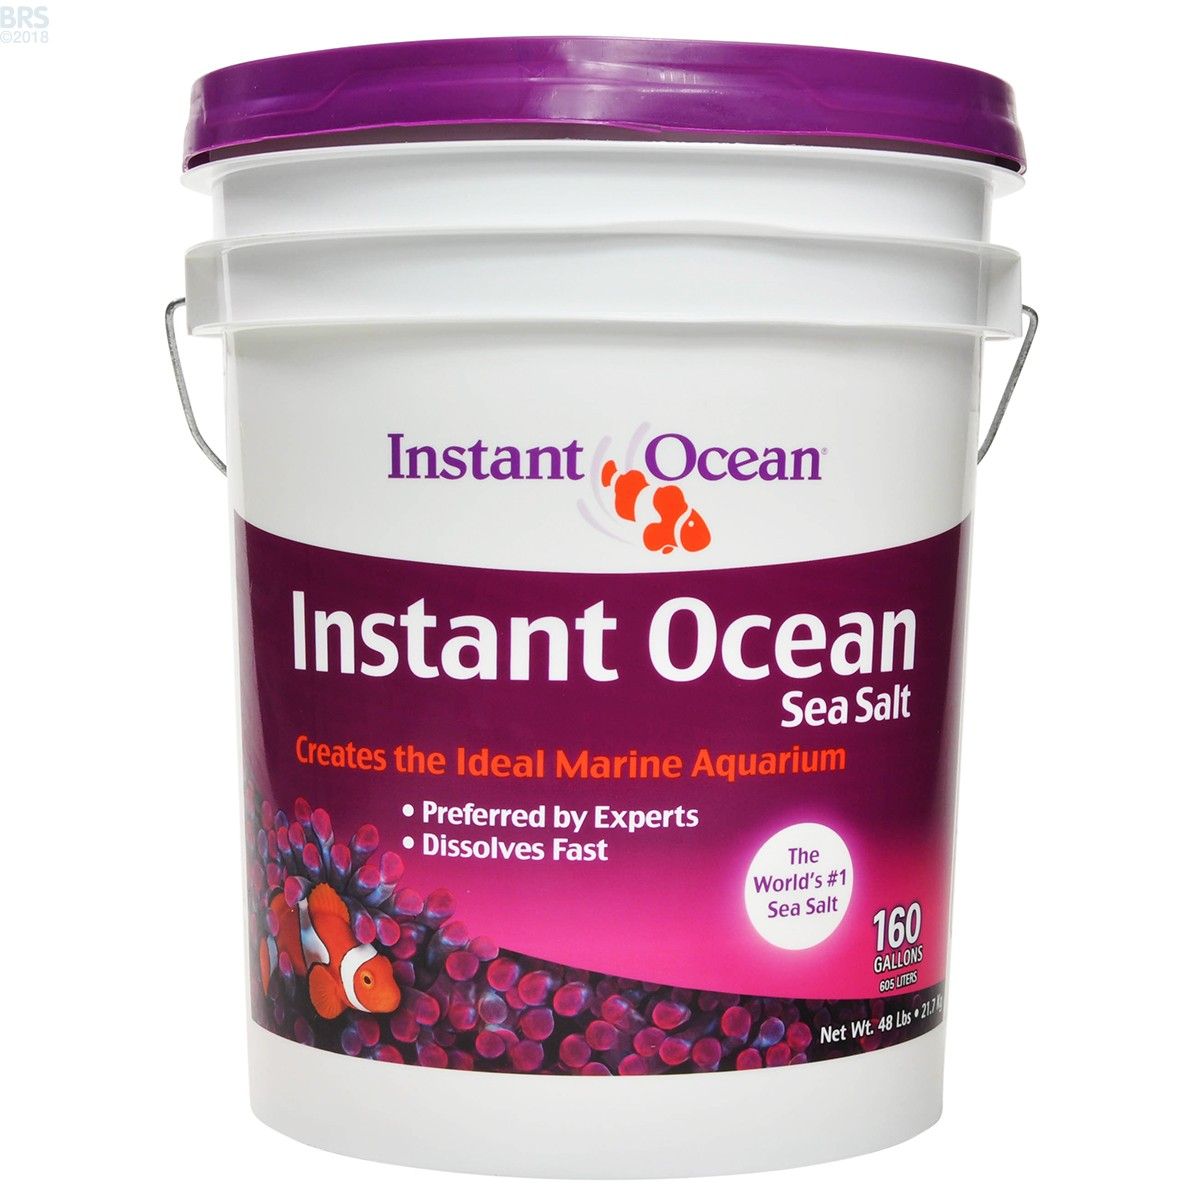 5 Gallon Mix Instant Ocean : Sea salt mix instant ocean bulk reef supply